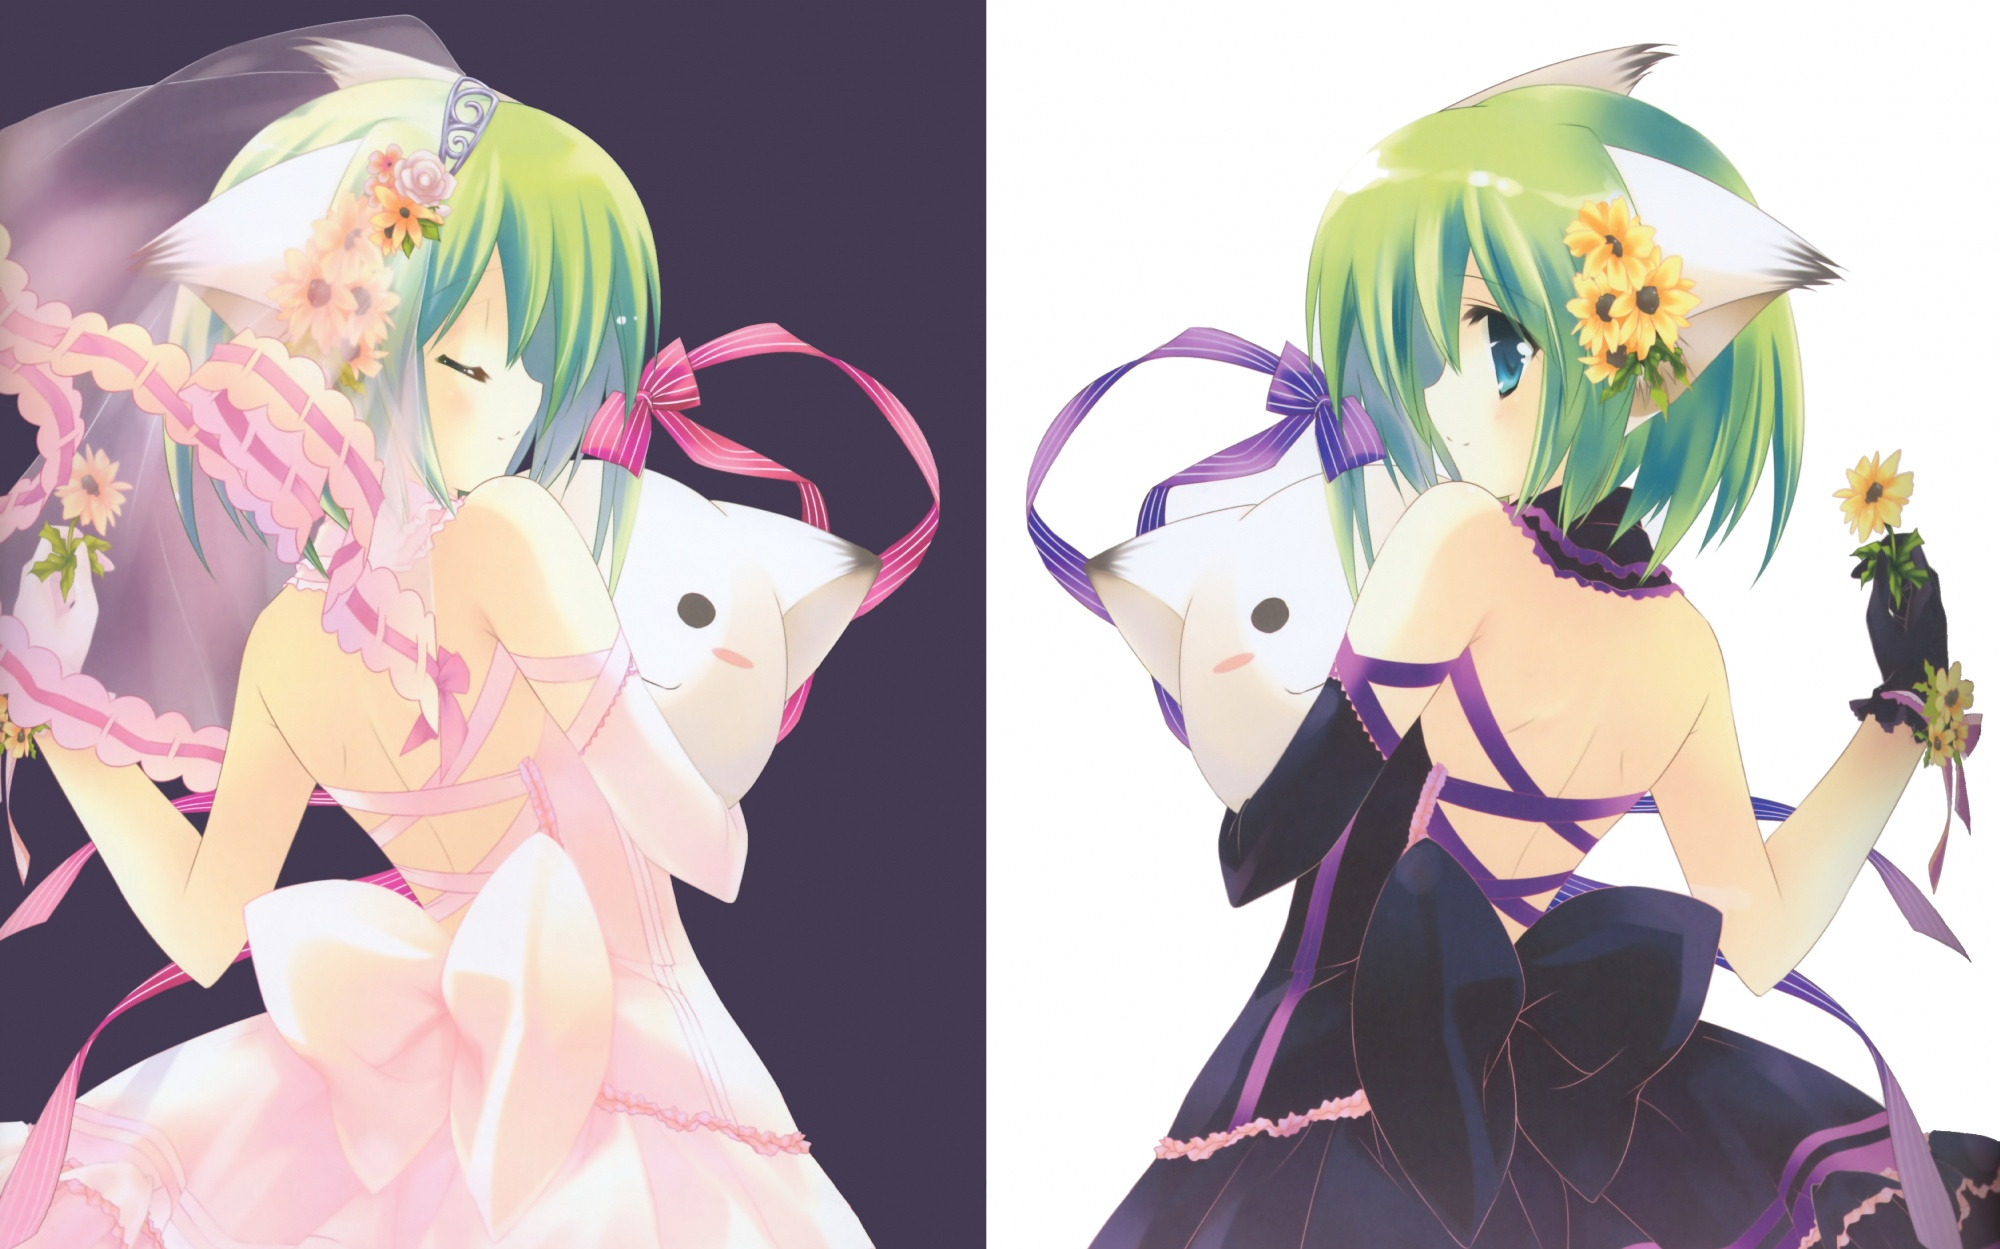 Neko Girl Wallpaper Pack 2 2000x1249